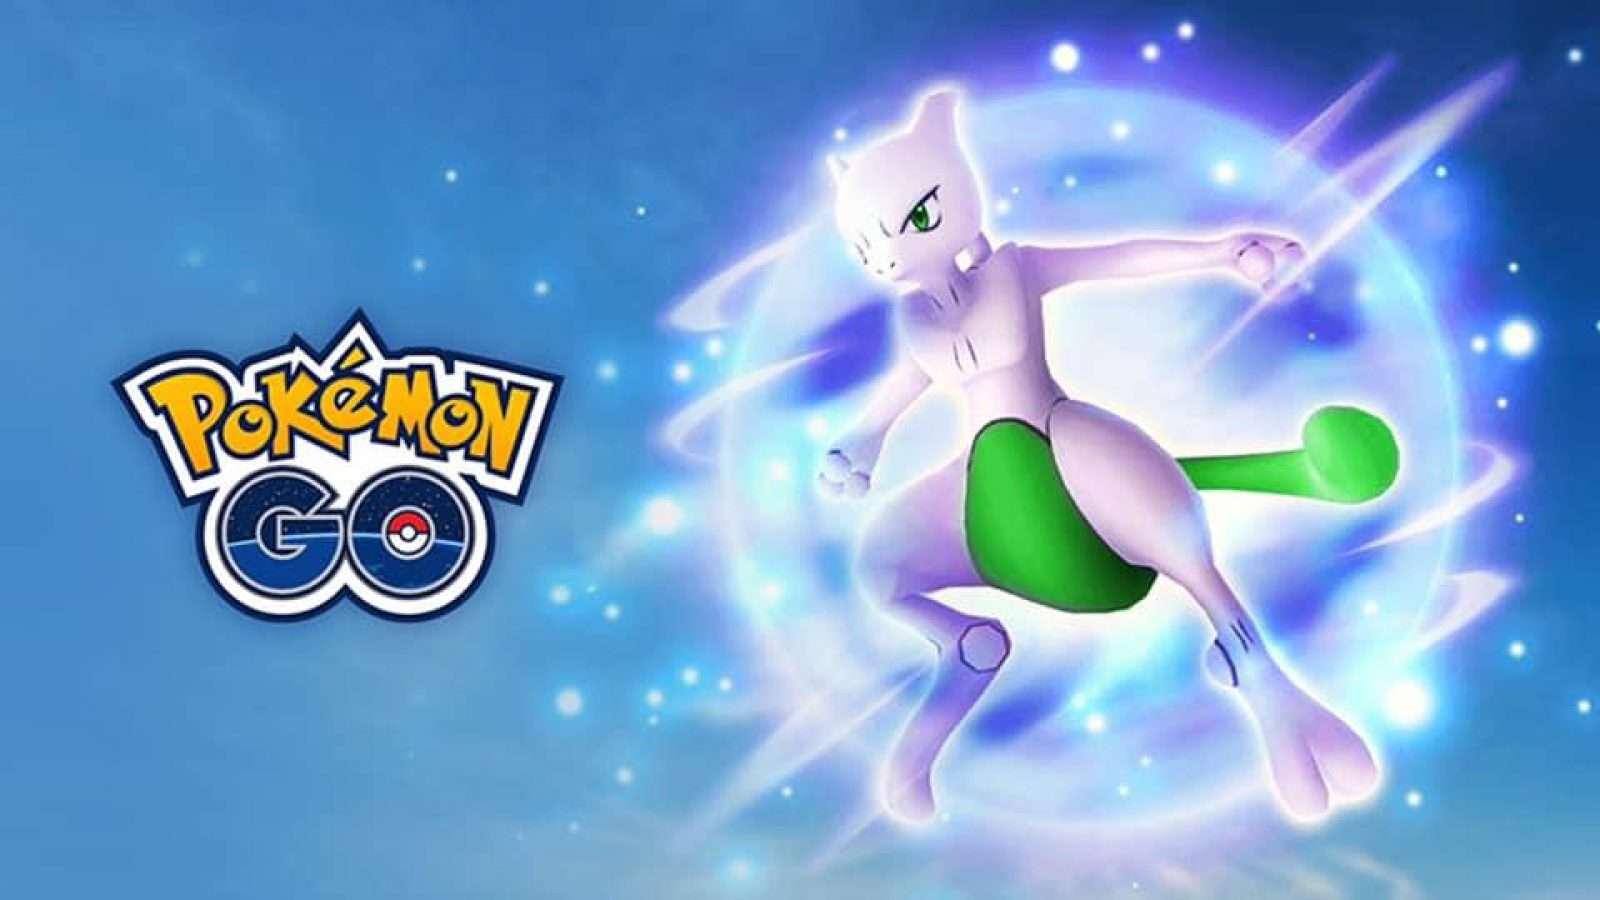 [Rescheduled] Pokemon Go : Mewtwo Legendary Raid Hour postponed, Niantic apologizes